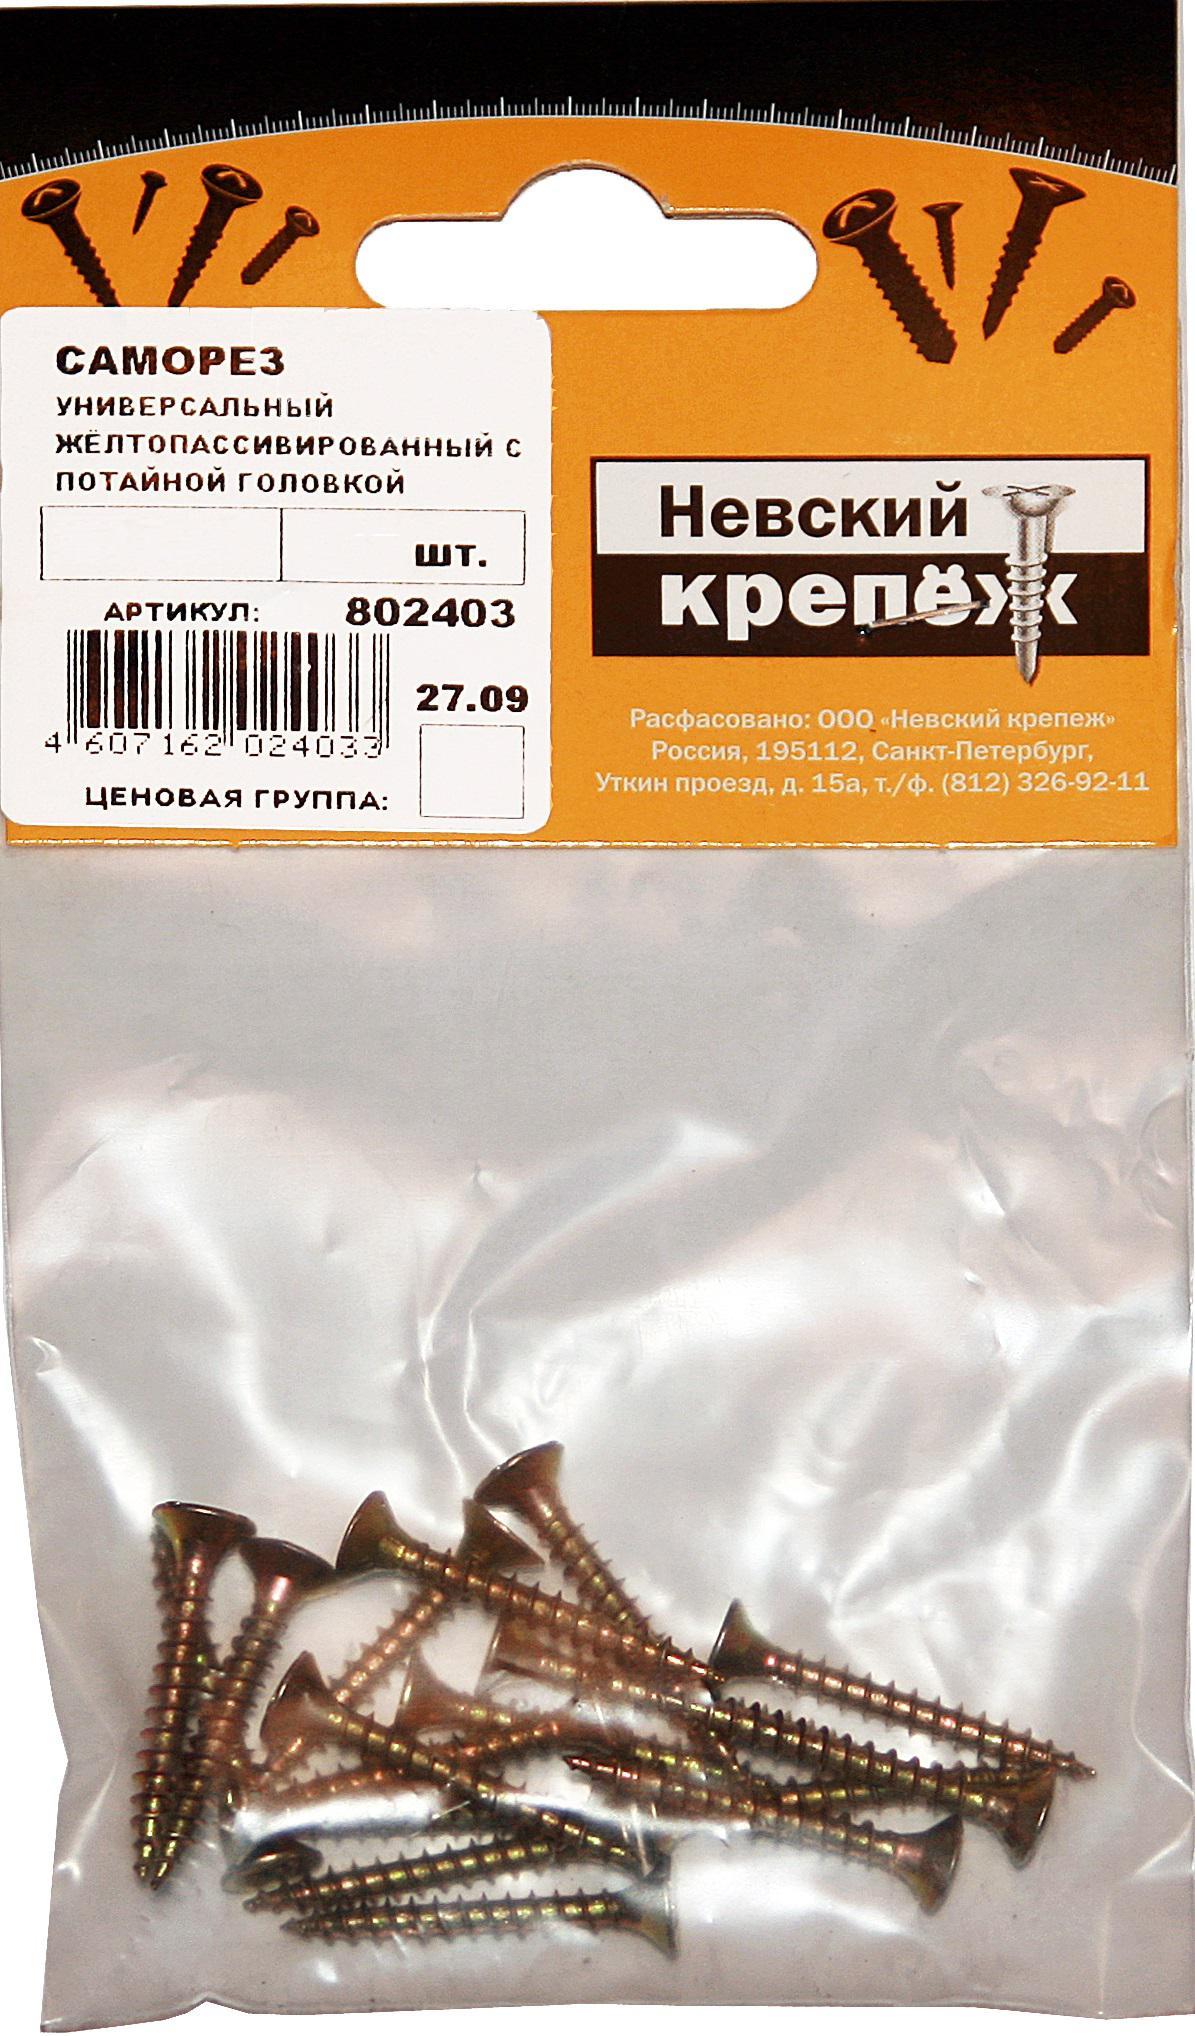 Саморез НЕВСКИЙ КРЕПЕЖ 802380